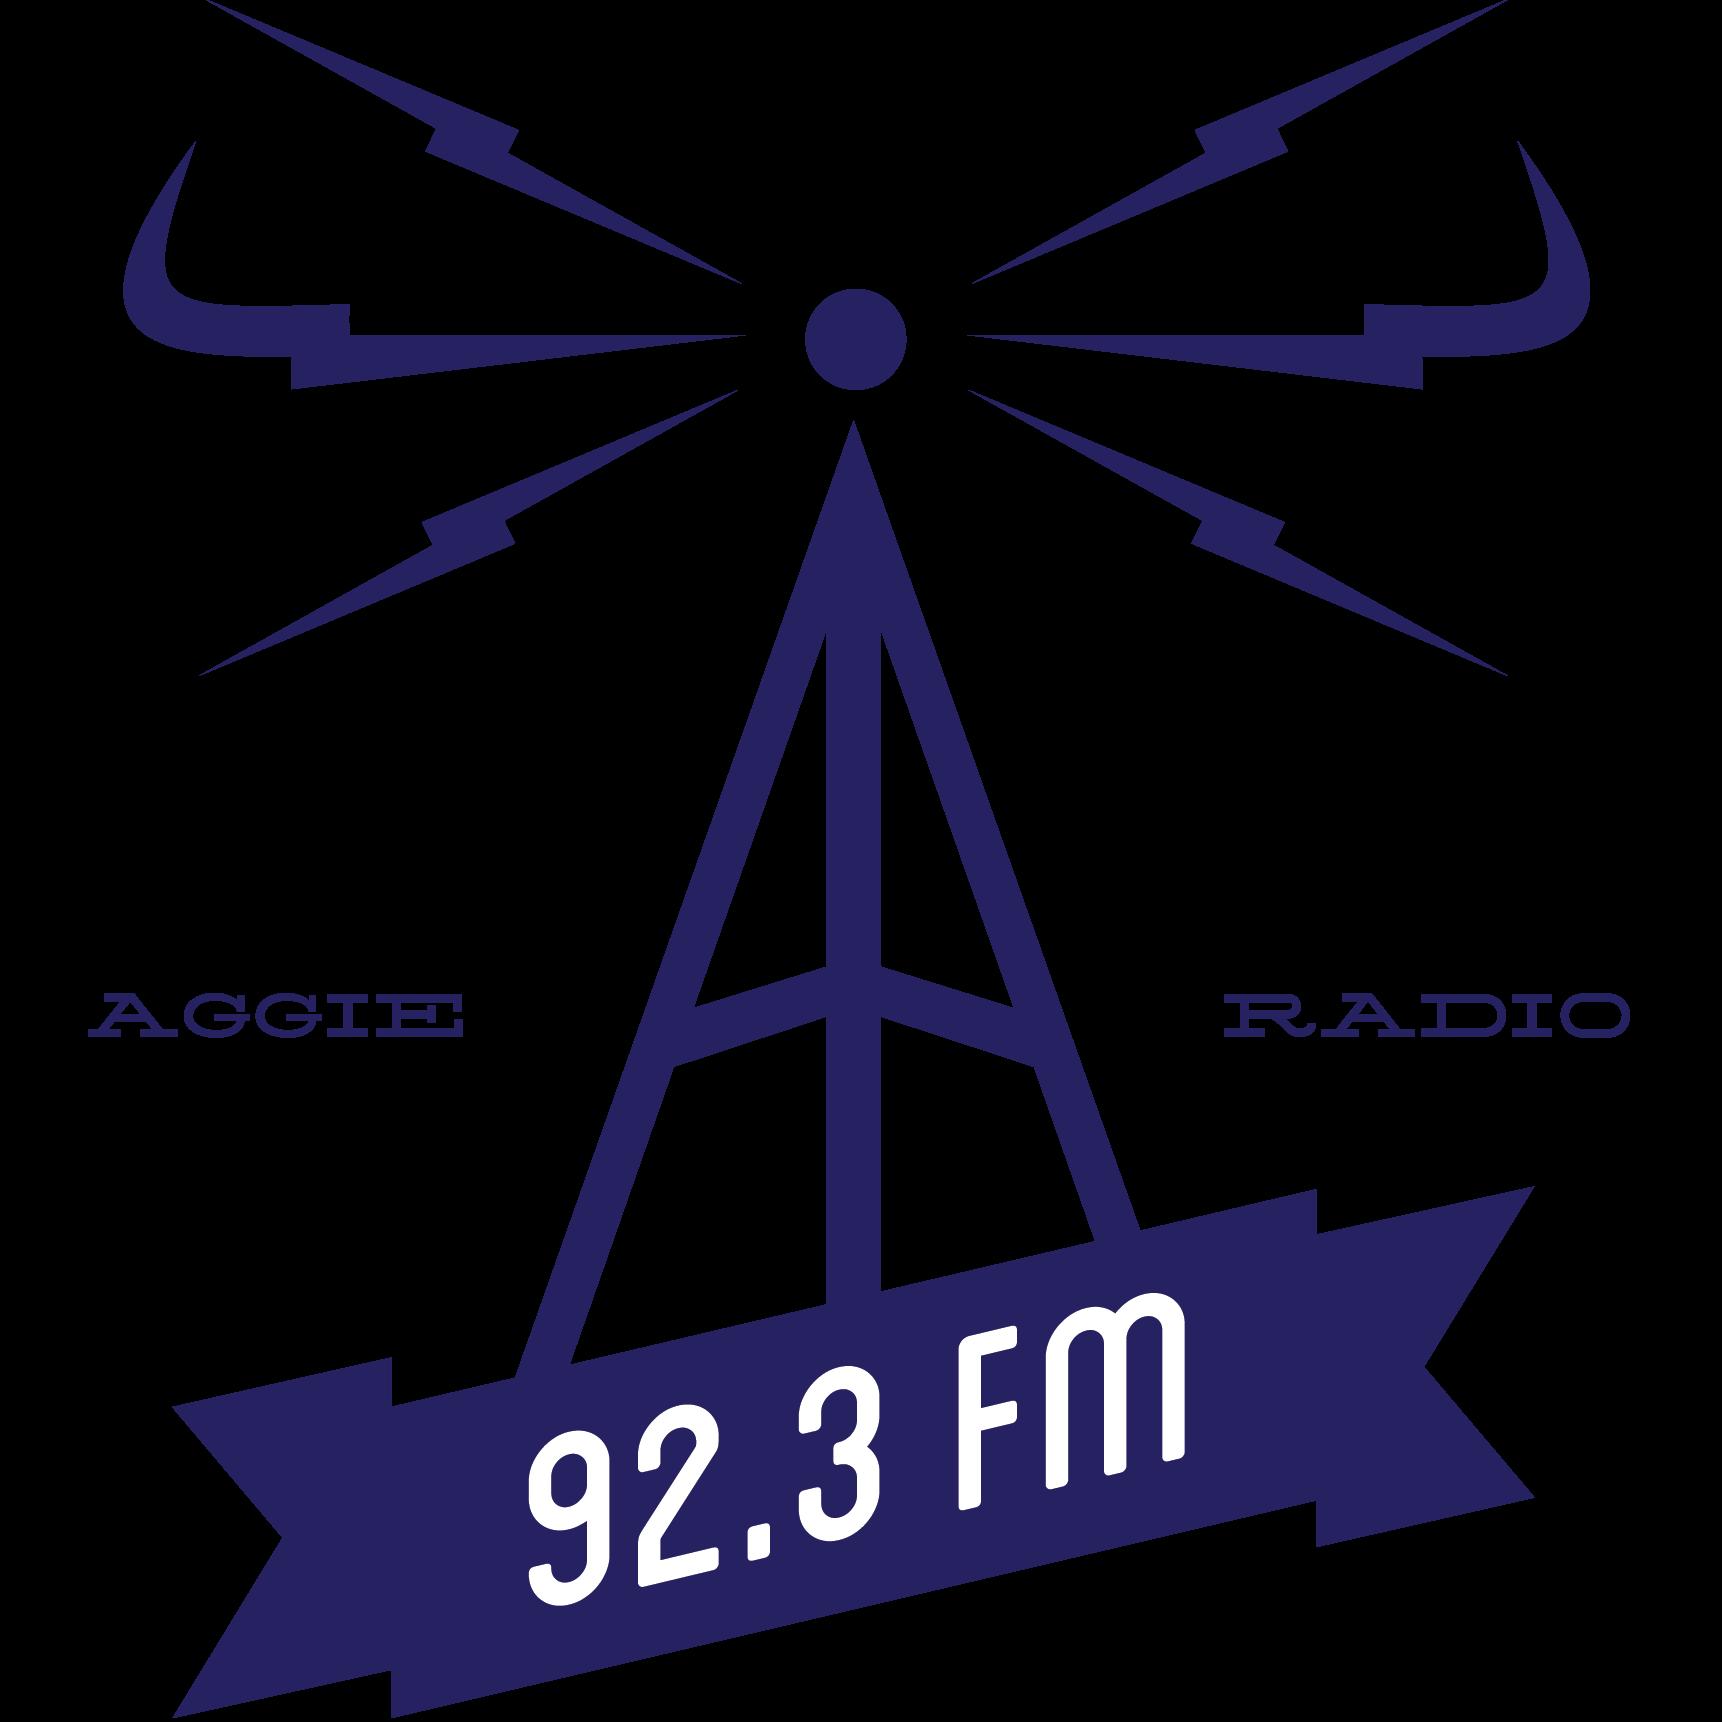 Aggie Radio 92.3 FM KBLU-LP